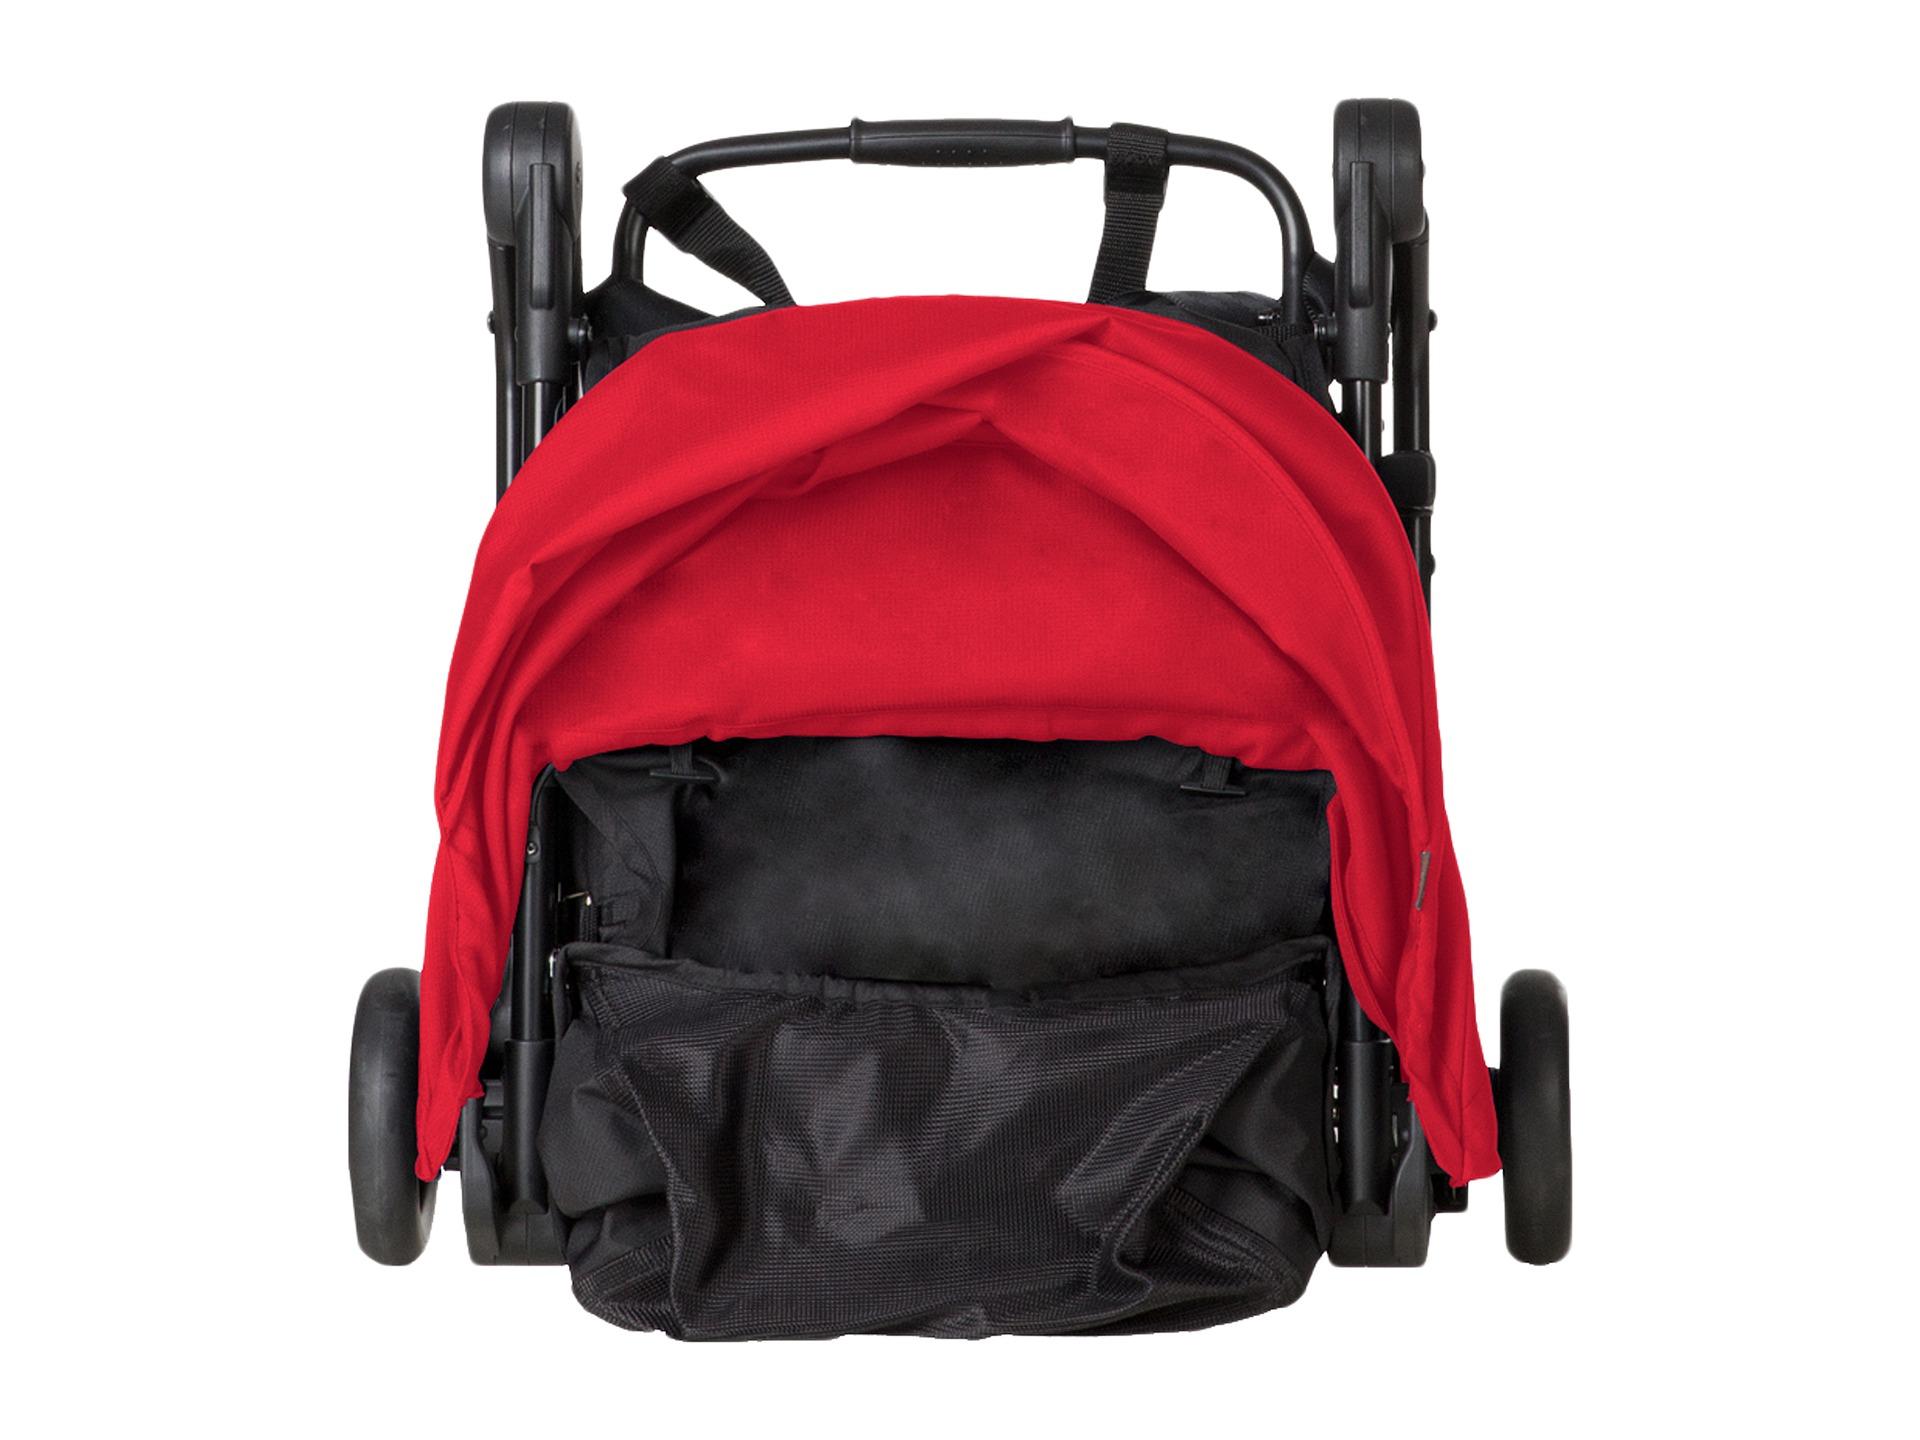 mountain buggy nano stroller free shipping. Black Bedroom Furniture Sets. Home Design Ideas